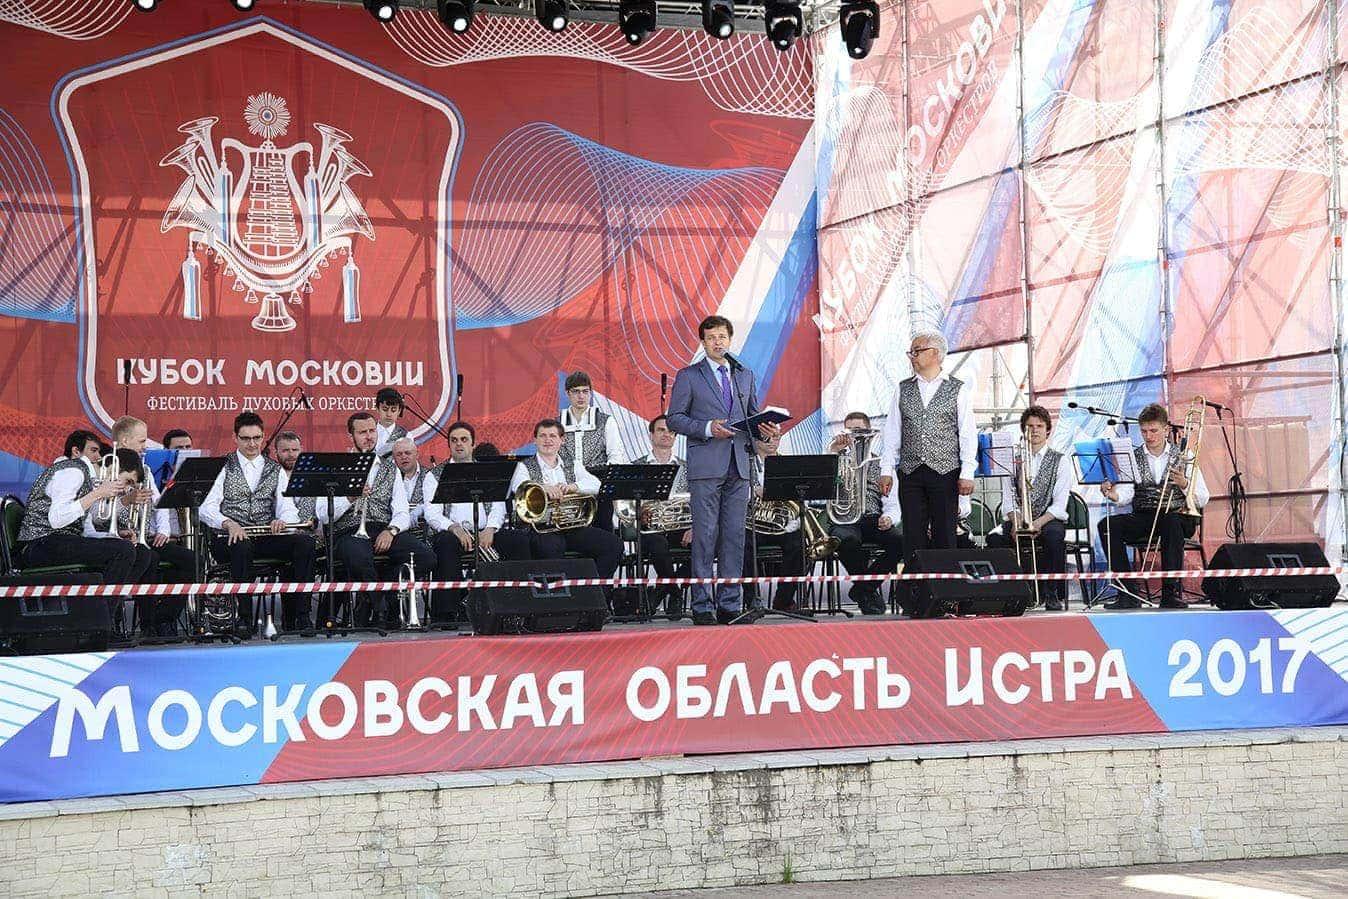 Фестиваль «Кубок Московии». Фото - Леонид Шамшин